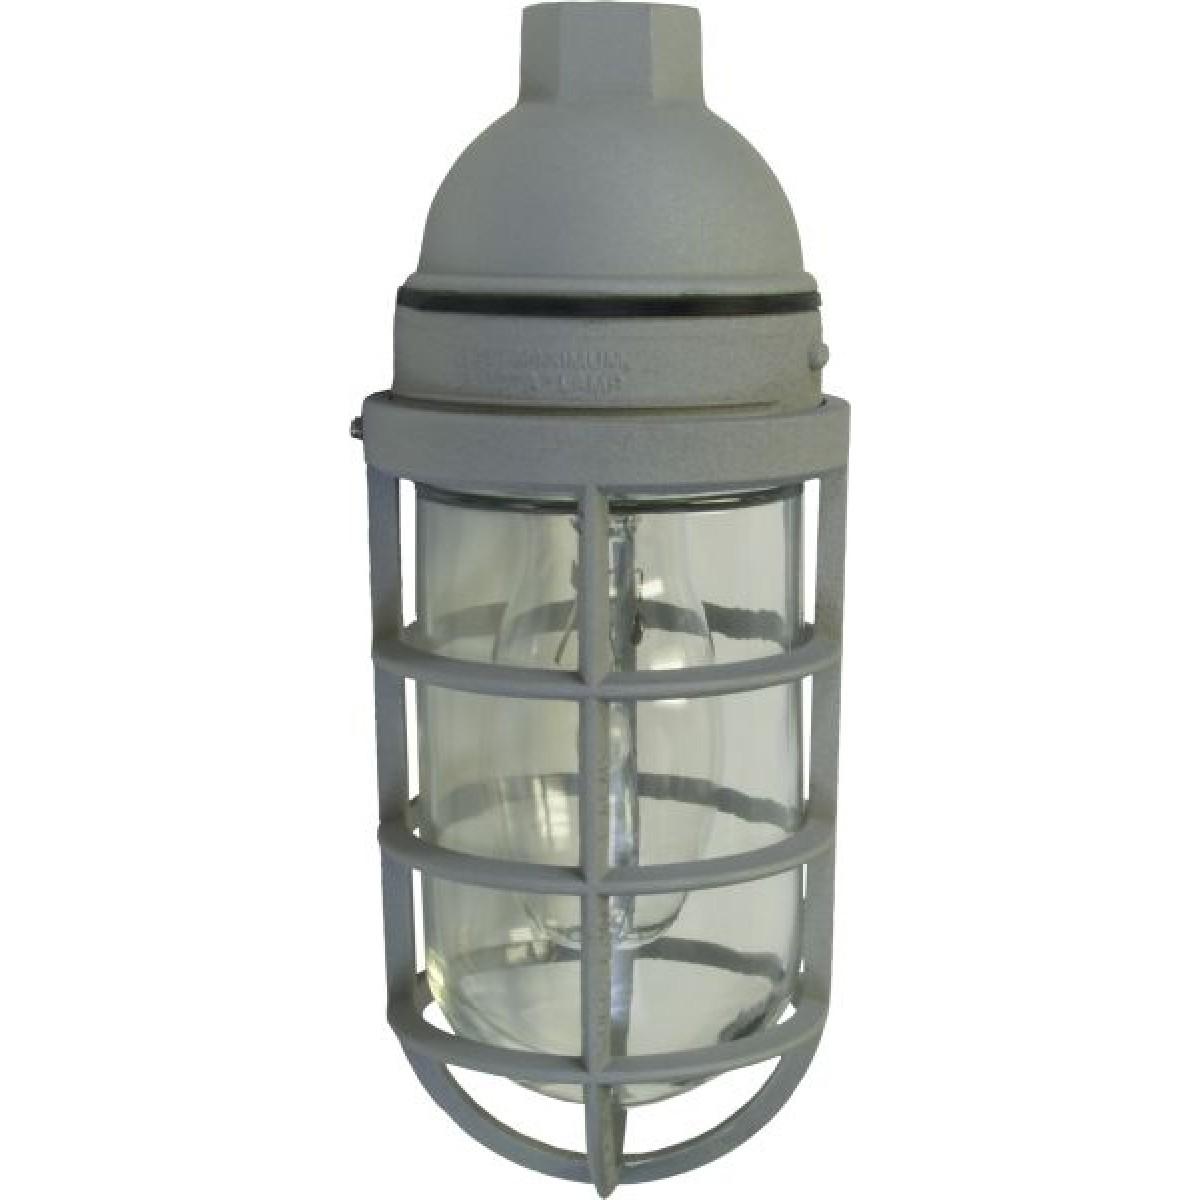 home line voltage hid lighting vapor proof fixtures vpp2. Black Bedroom Furniture Sets. Home Design Ideas